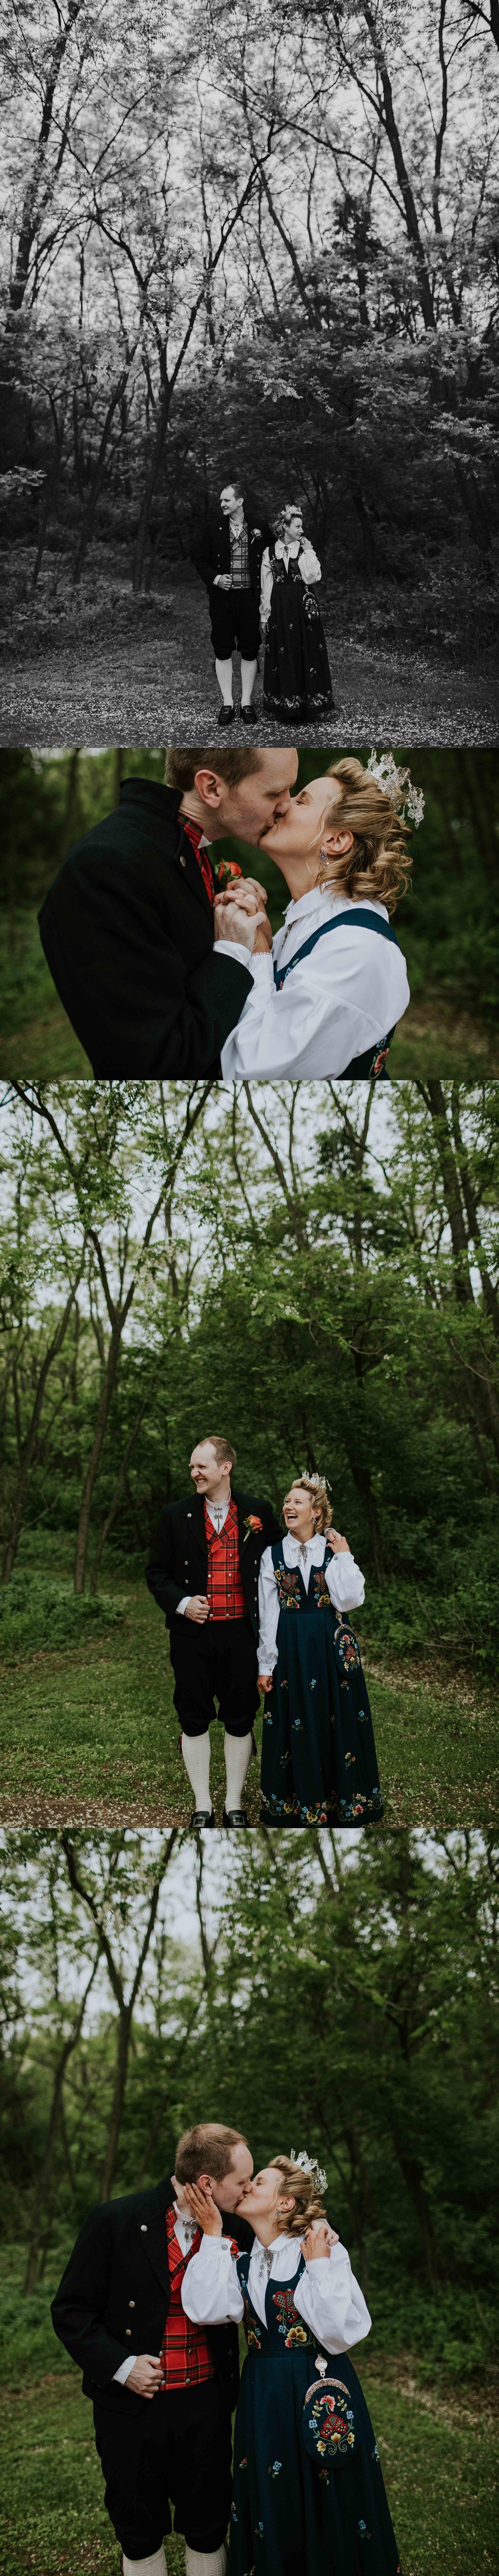 Norwegian Wedding Stevens Point Wisconsin Wedding Photographer Chloe Ann Photography_0022.jpg